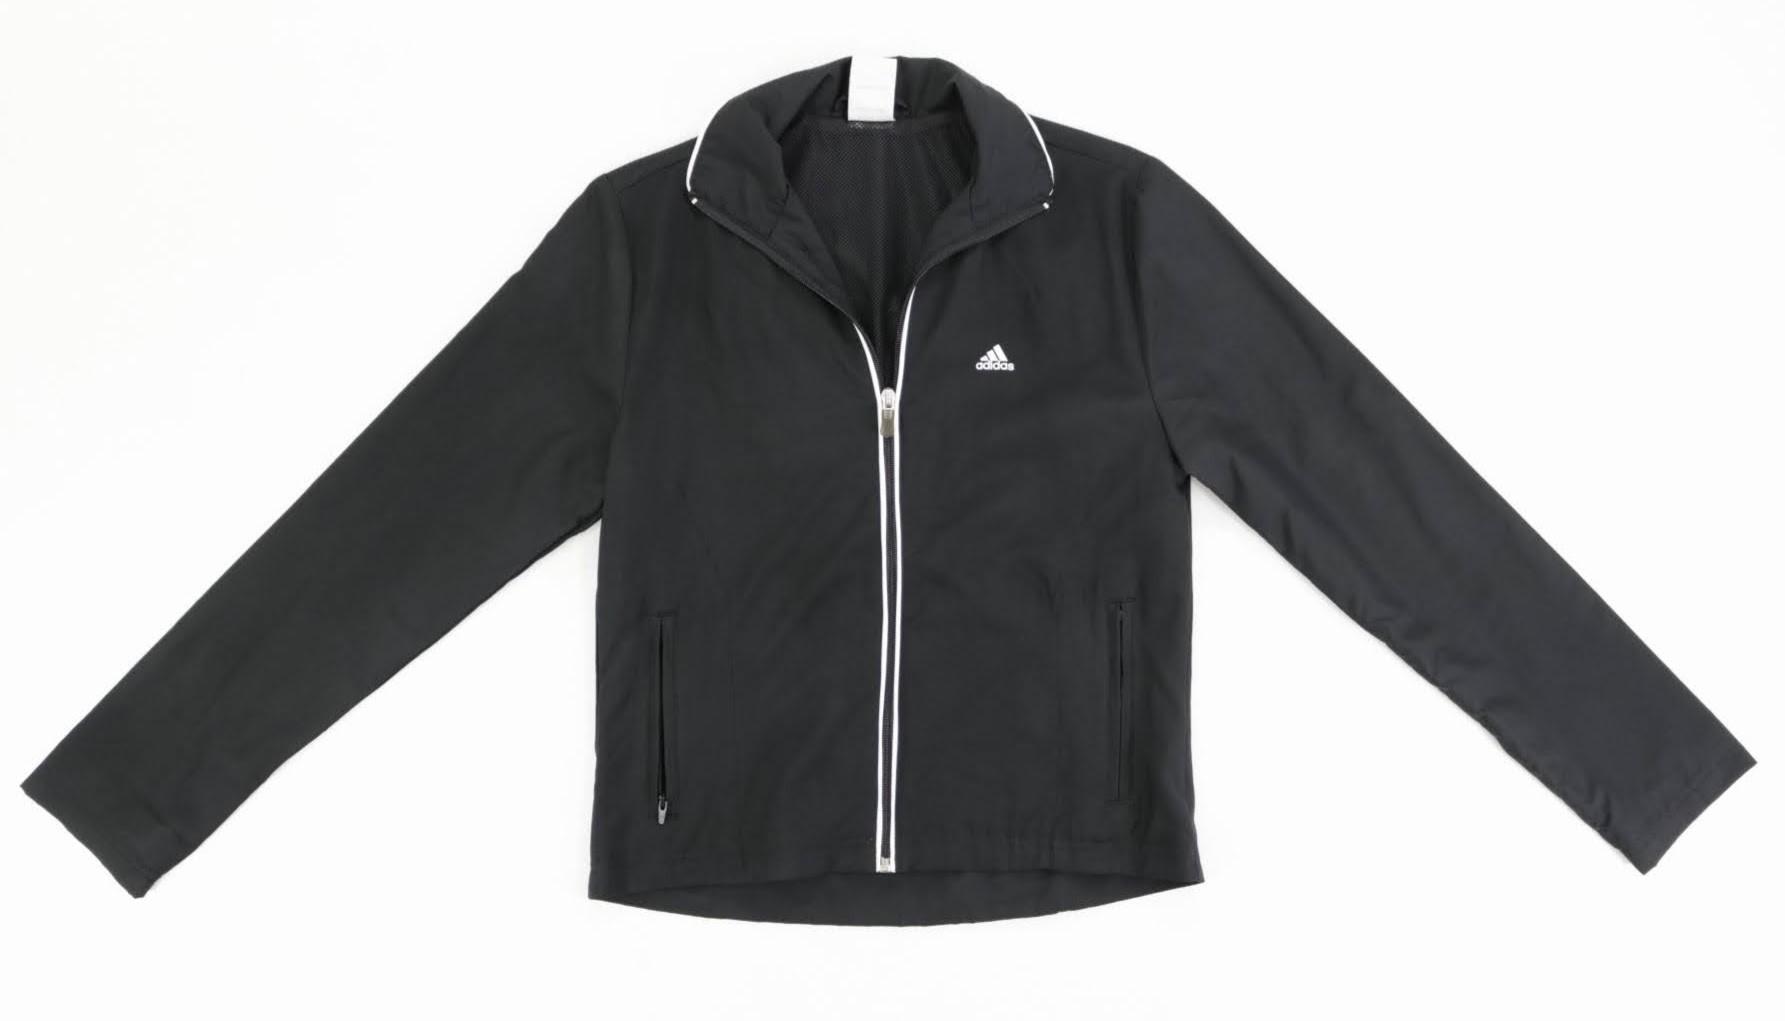 Jaqueta Adidas - Tam PP